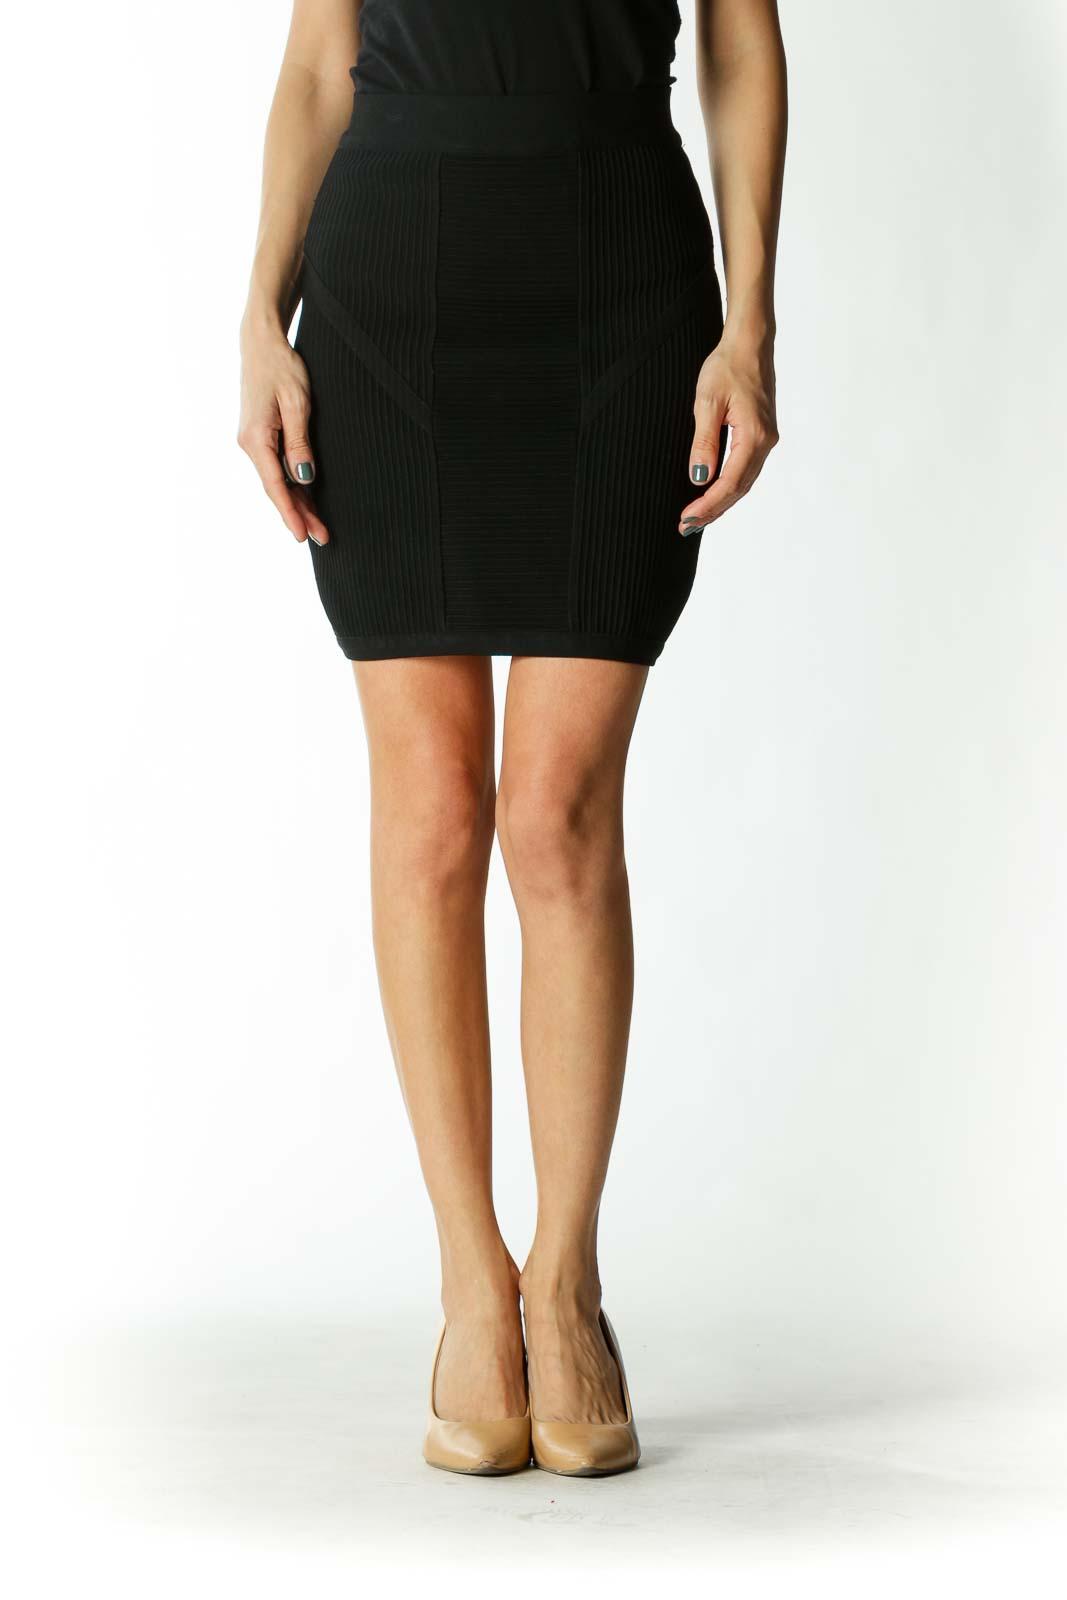 Black Cross-Ribbed Body-Con Mini Skirt Front